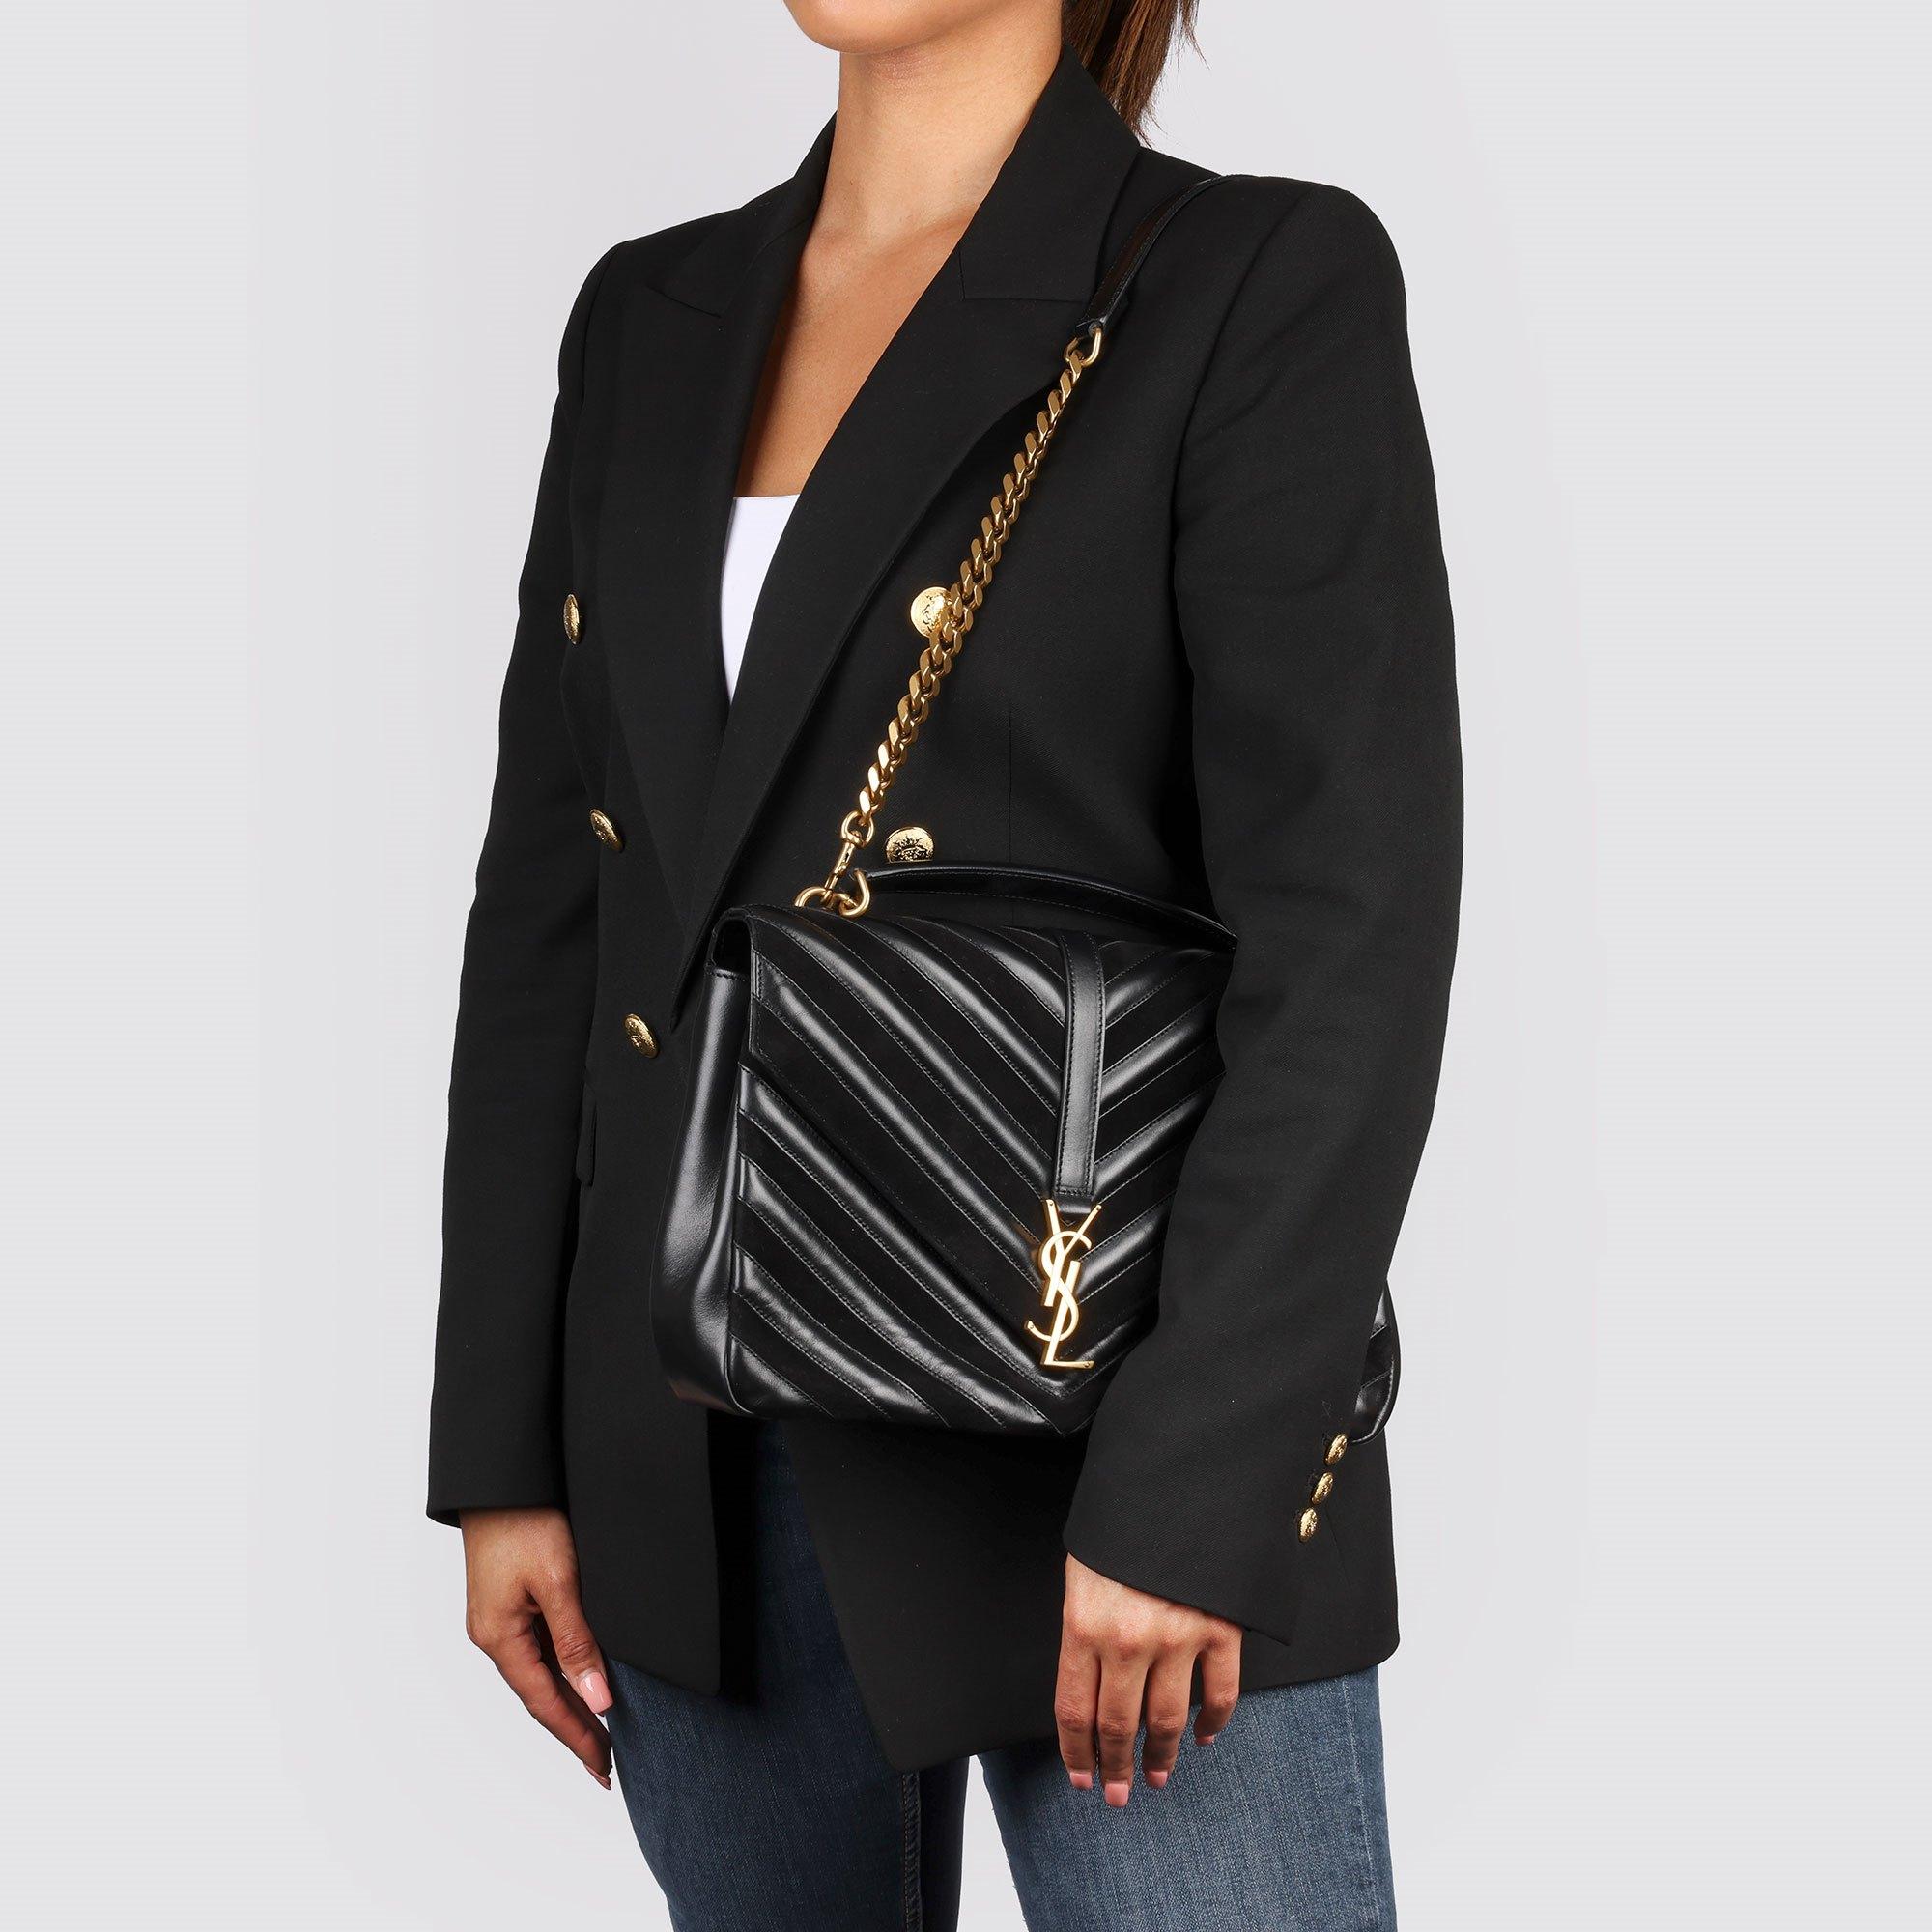 Saint Laurent Black Chevron Suede & Calfskin Leather Large College